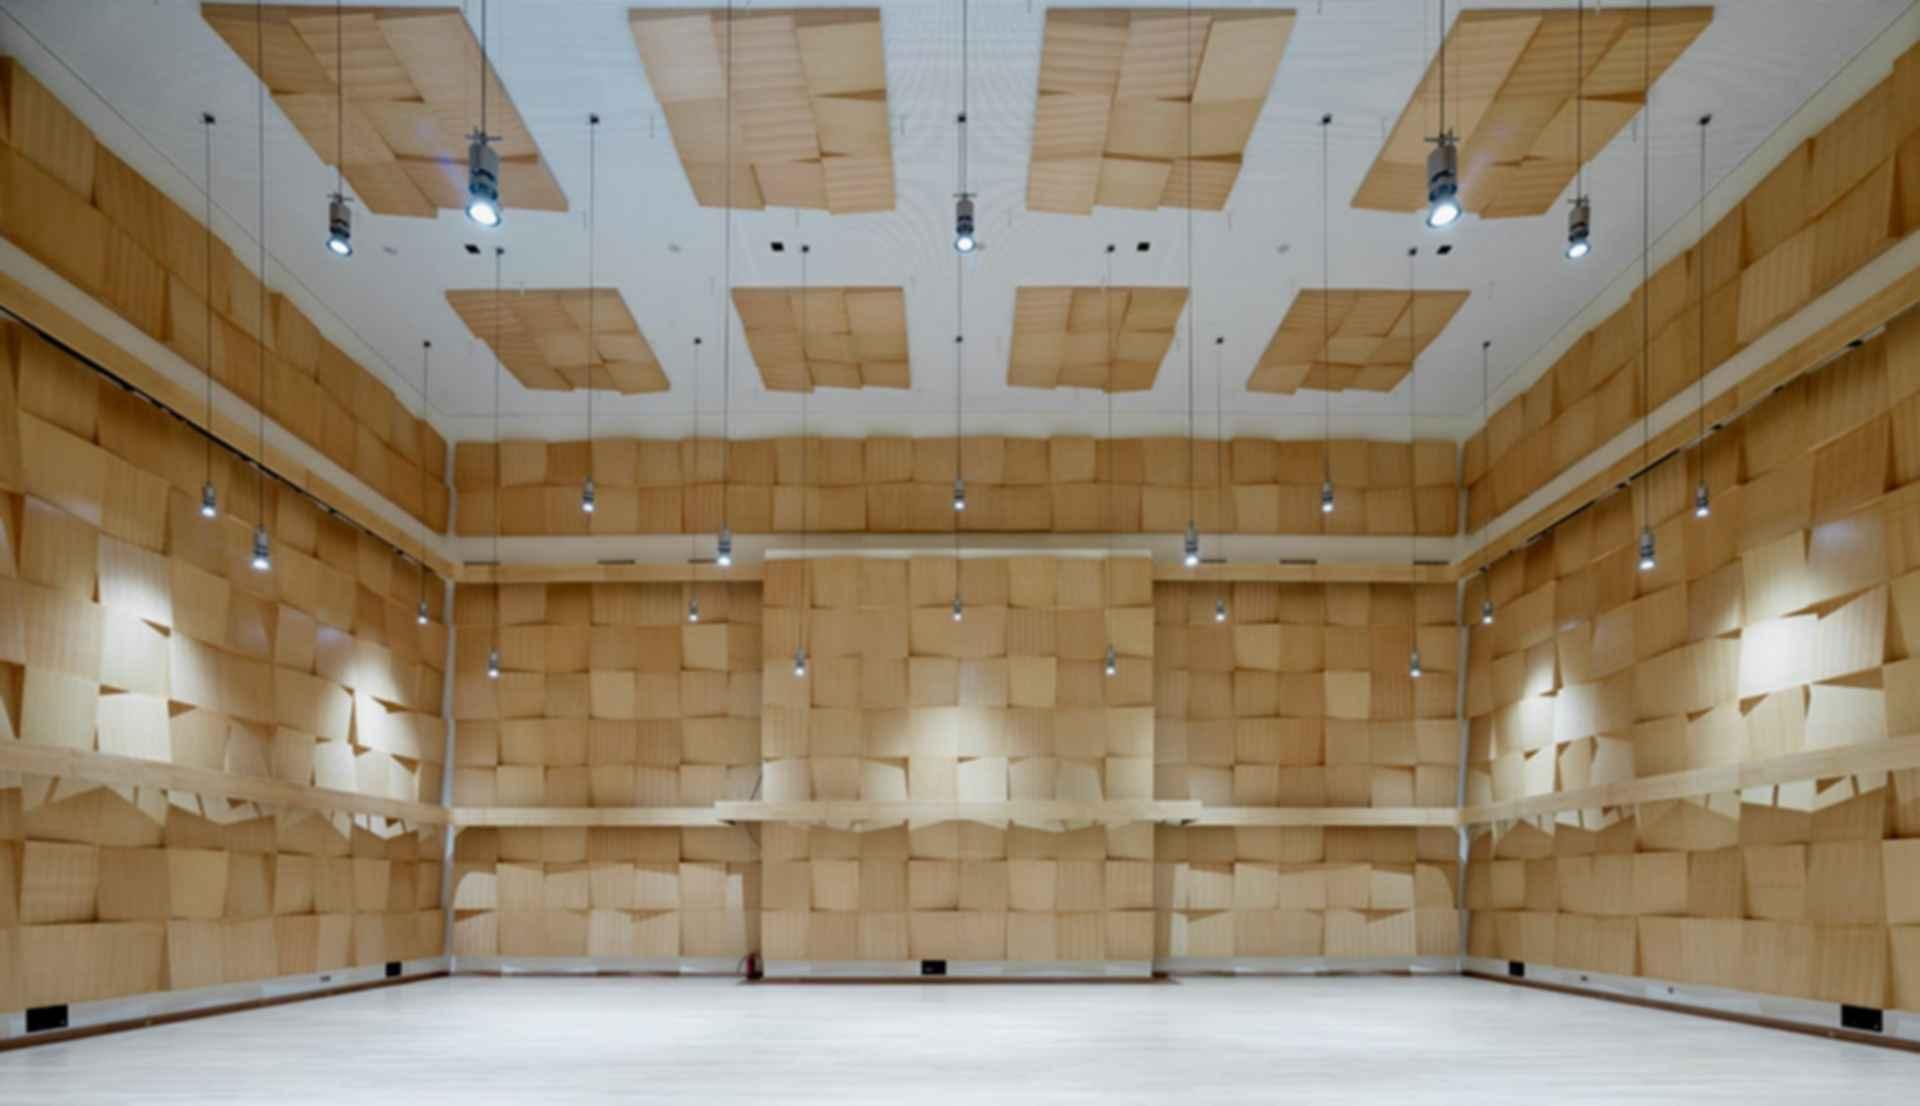 Stavros Niarchos Cultural Foundation - interior